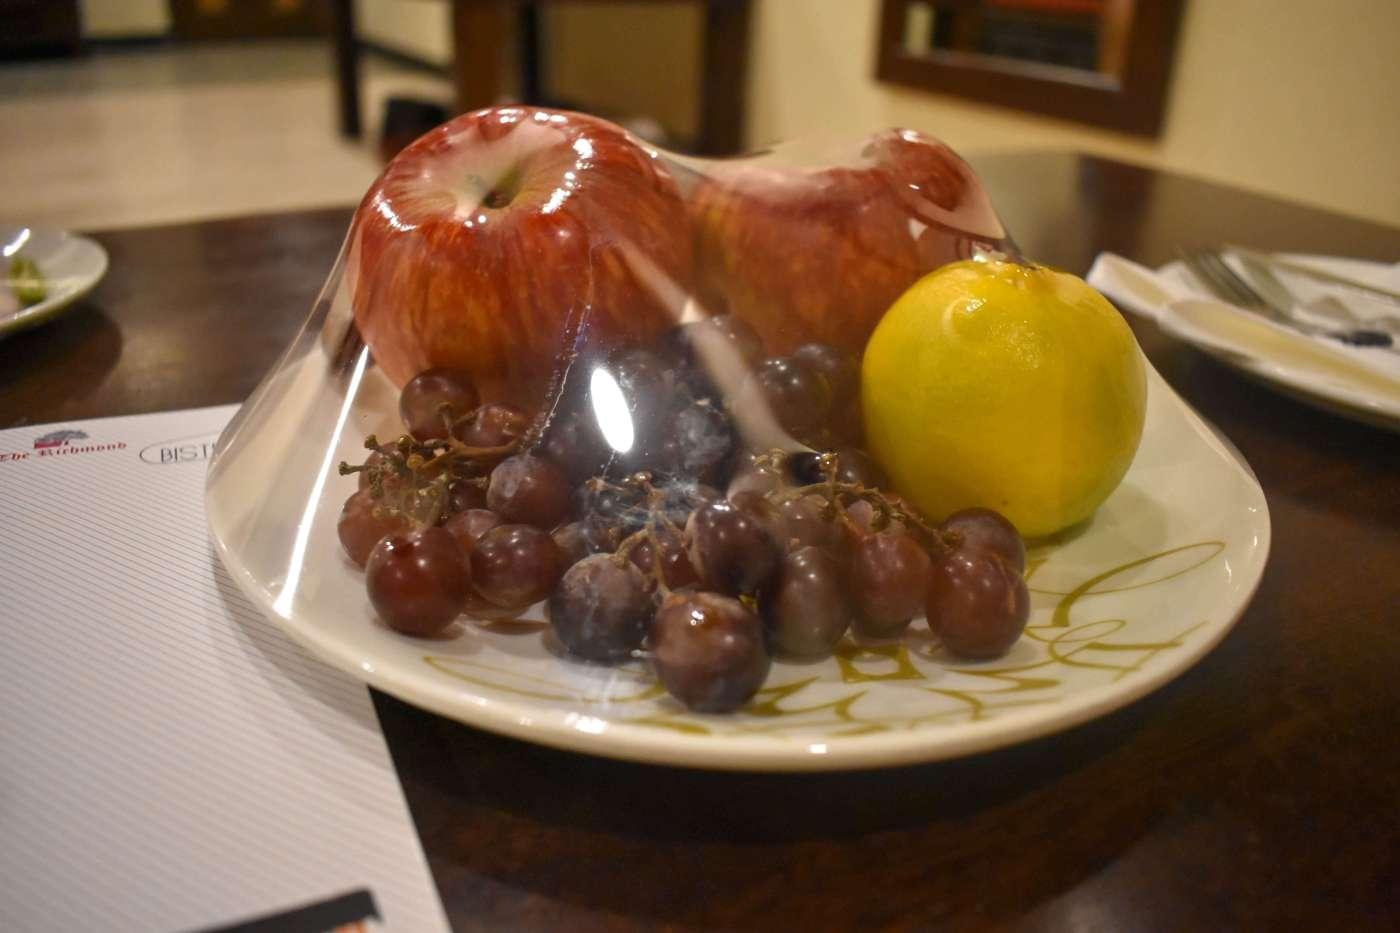 richmond fruits